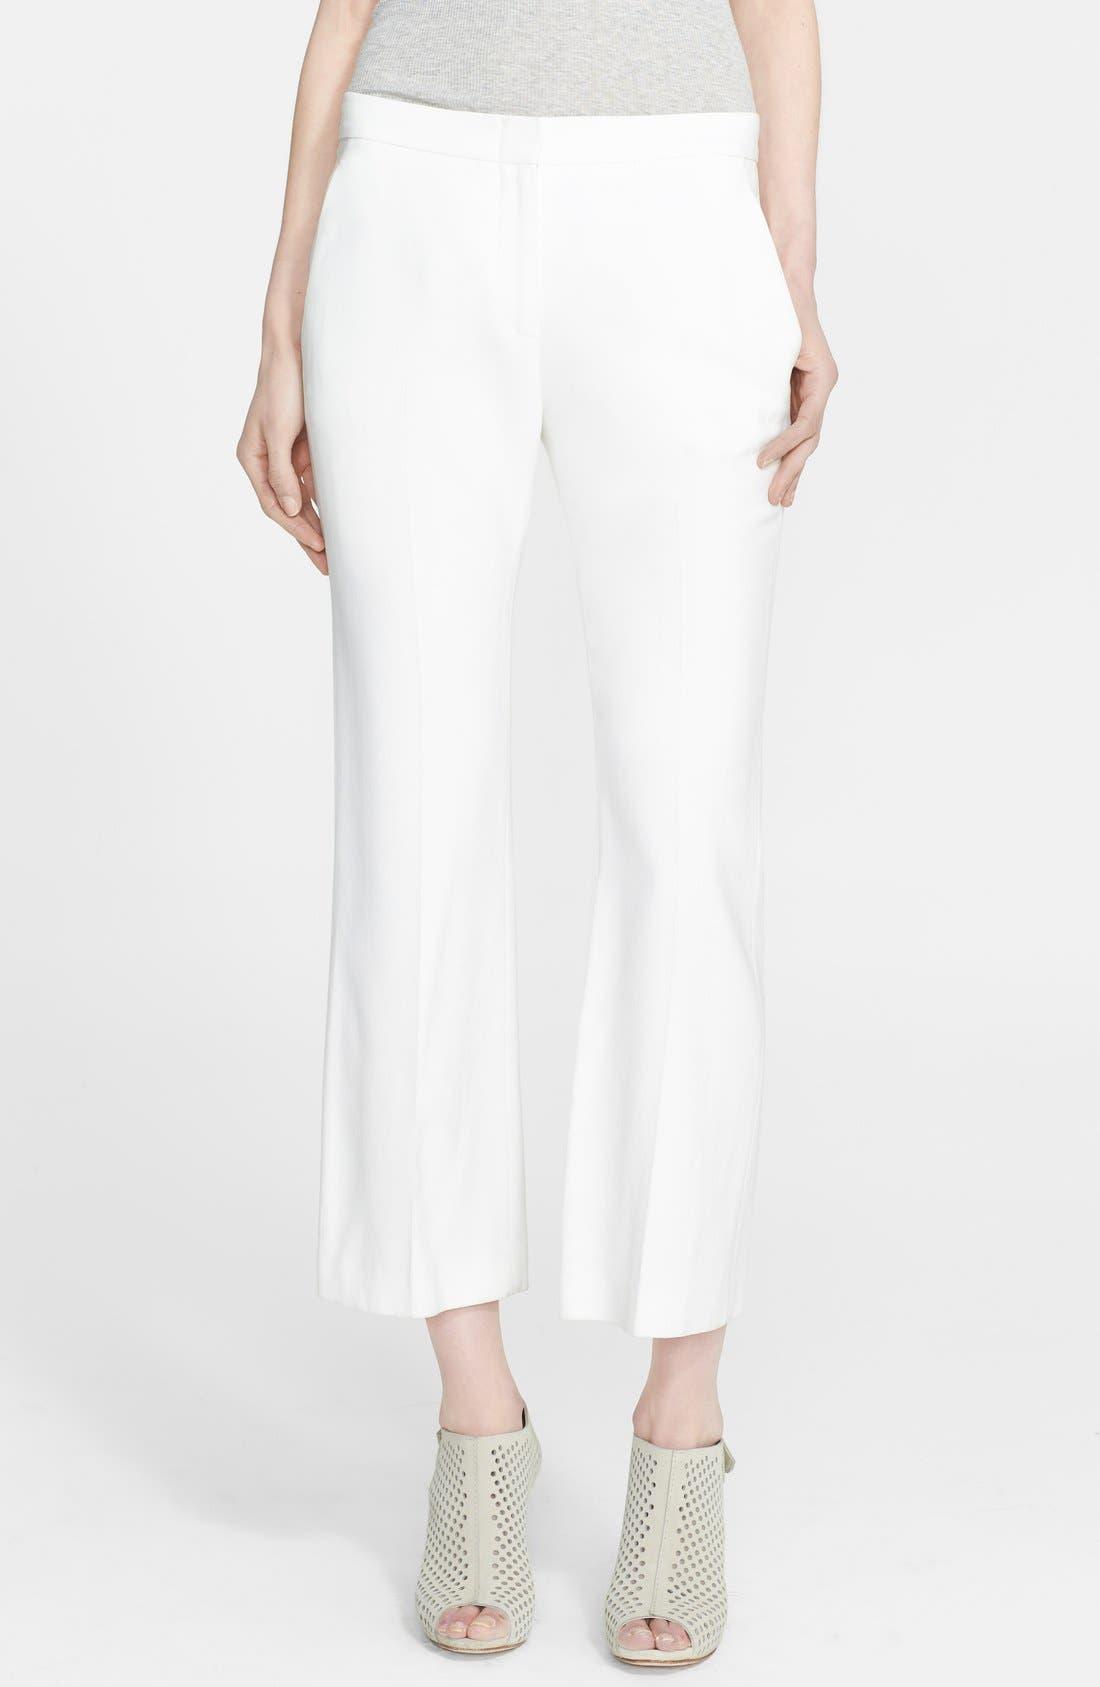 Alternate Image 1 Selected - Theory 'Benetta' Crop Pants